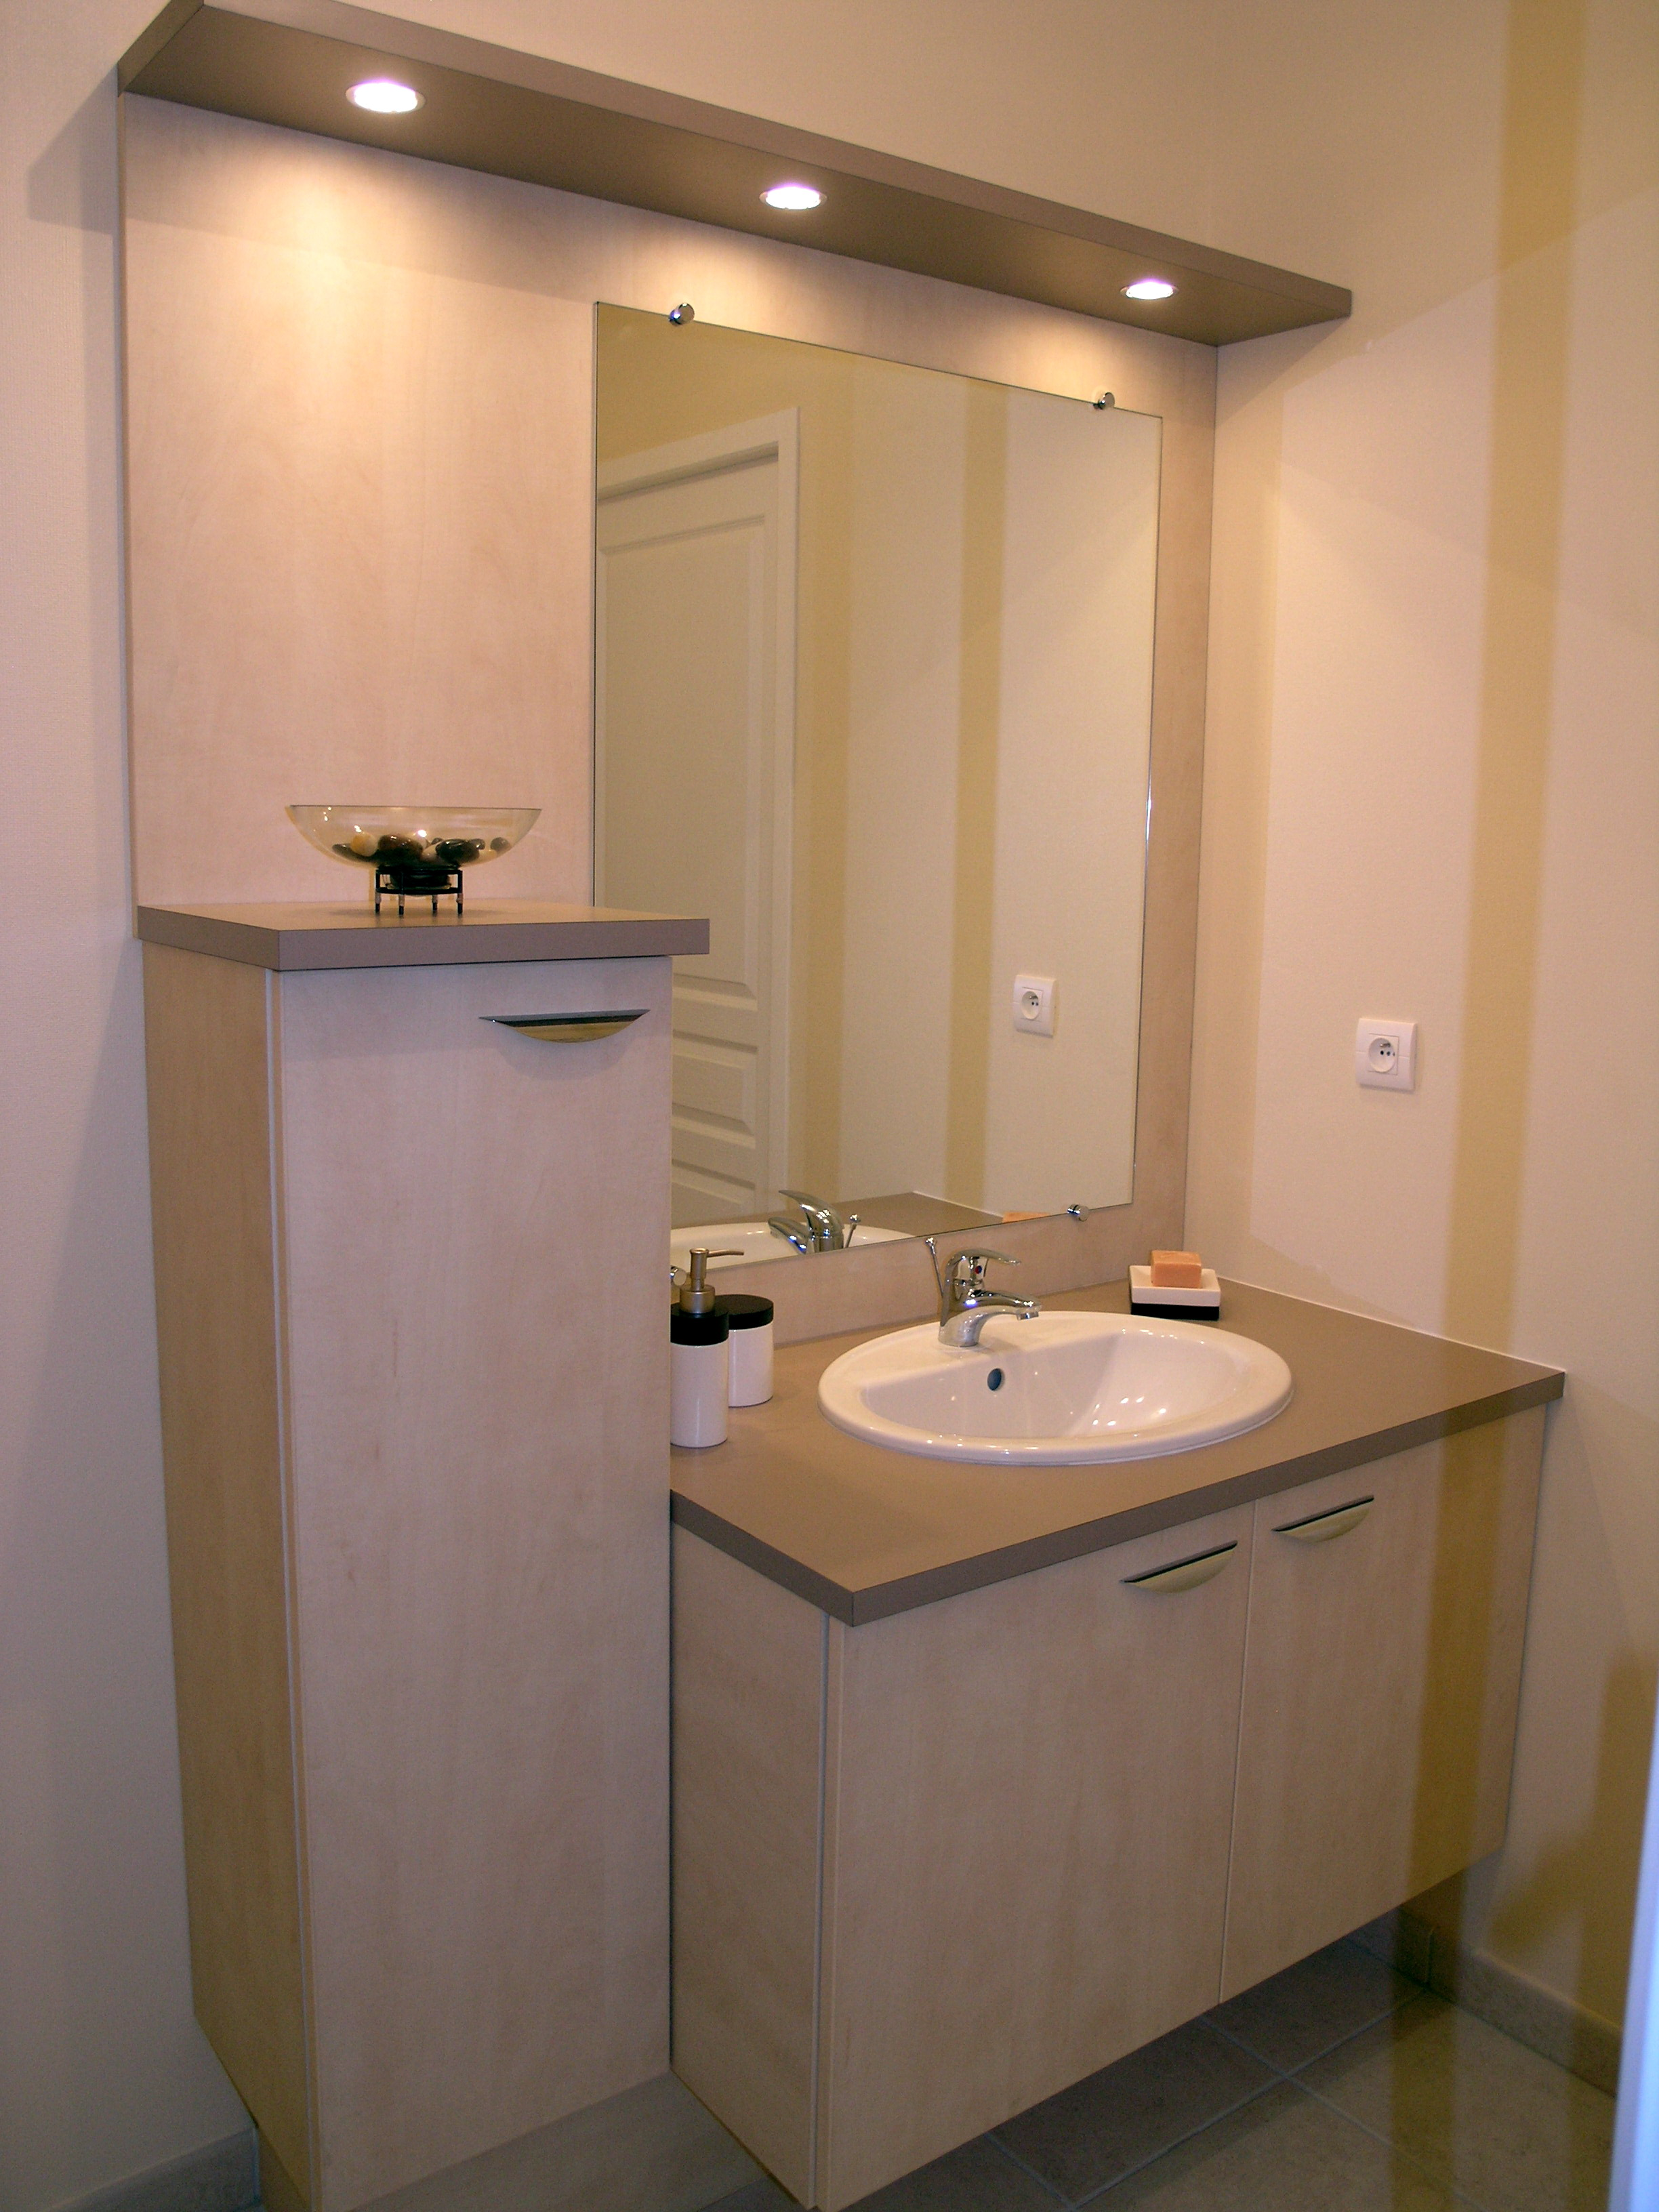 Meuble de salle de bains sur mesure avec miroir et bandeau for Eclairage miroir salle de bain ikea